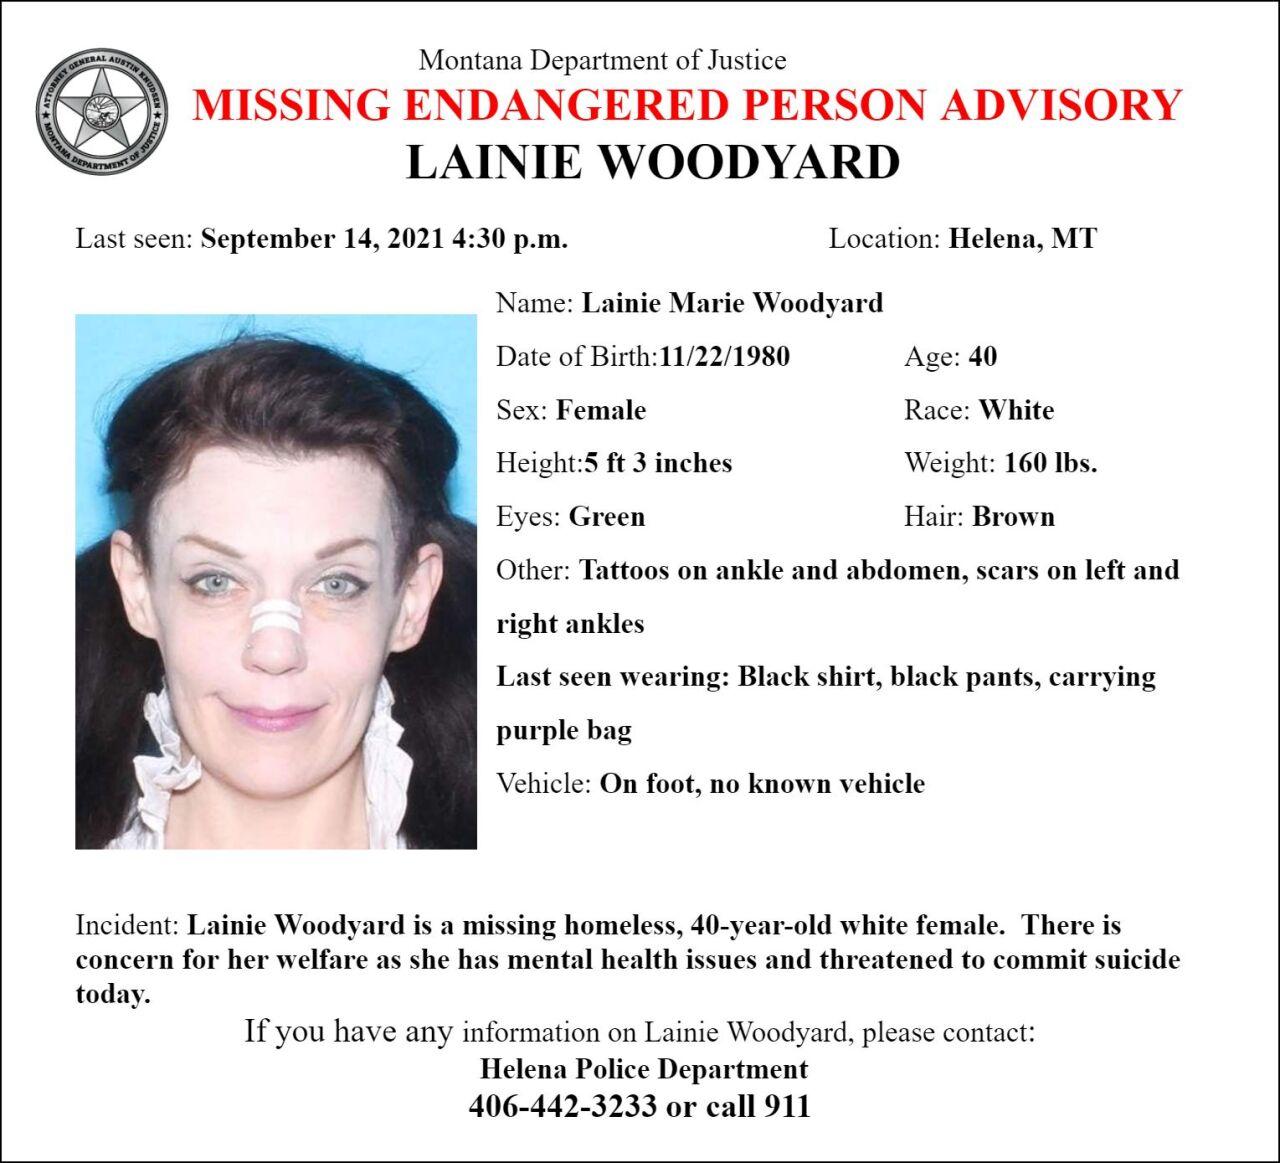 Missing Endangered Person Advisory for Lainie Woodyard